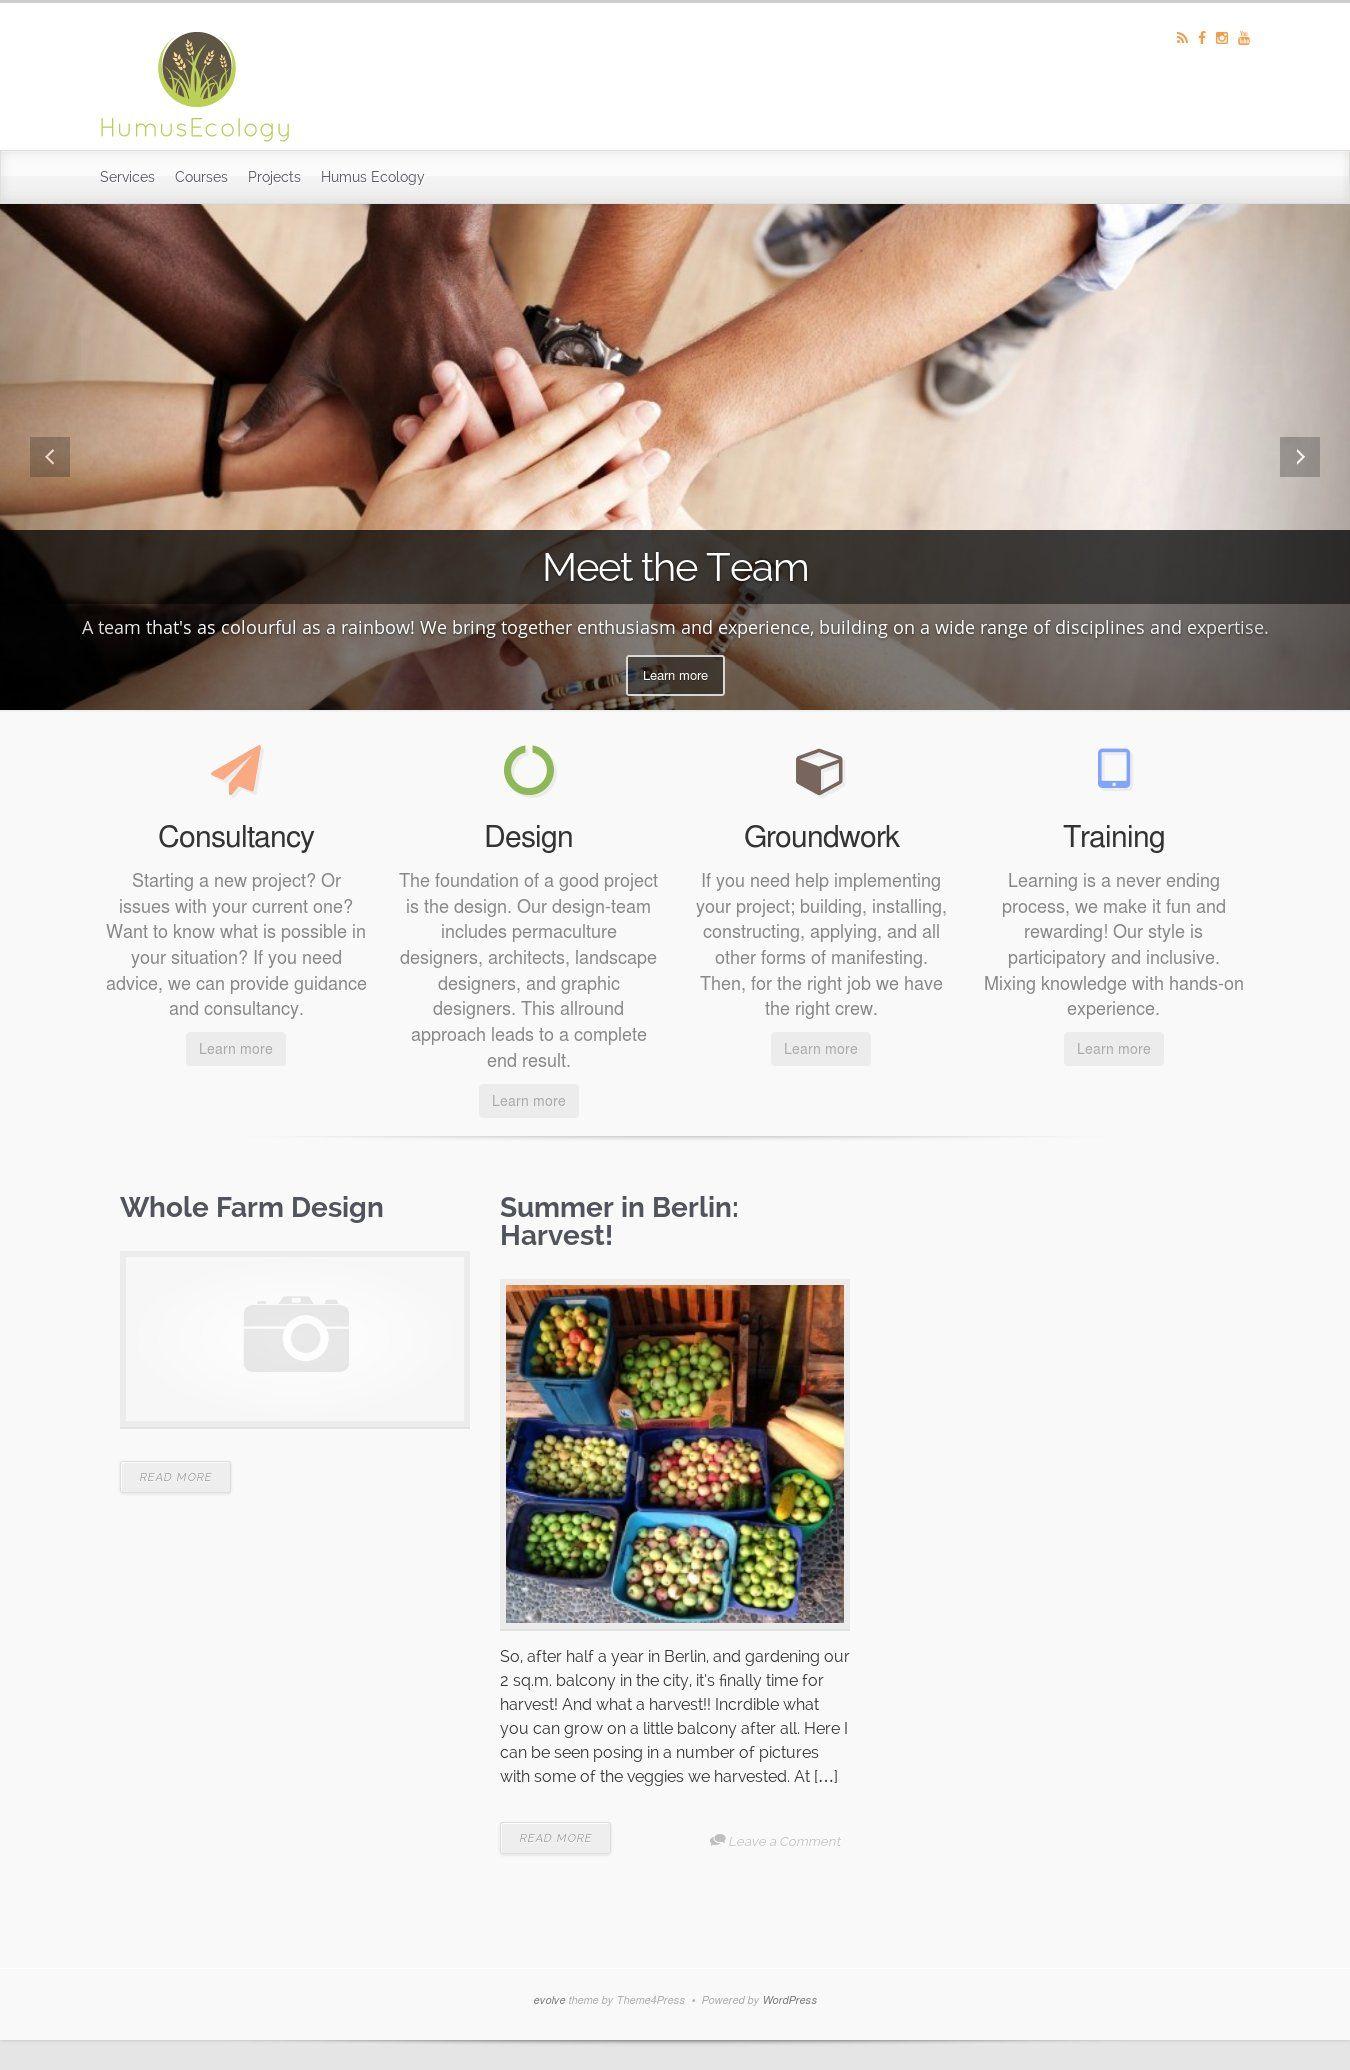 WordPress site humusecology uses the Evolve theme